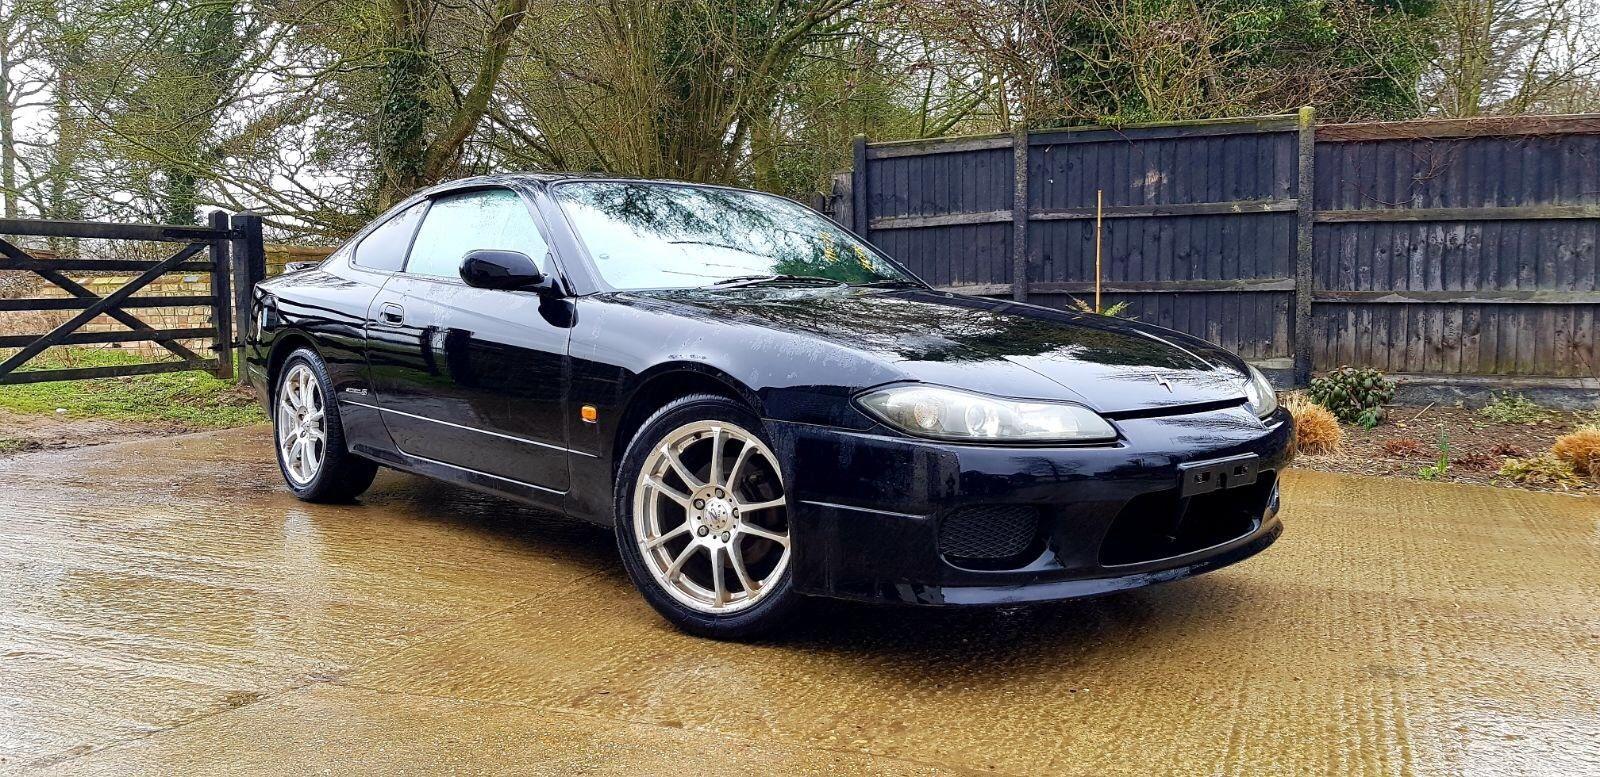 Nissan Silvia S15 Spec S Fresh Import Great Project Car | Nissan ...